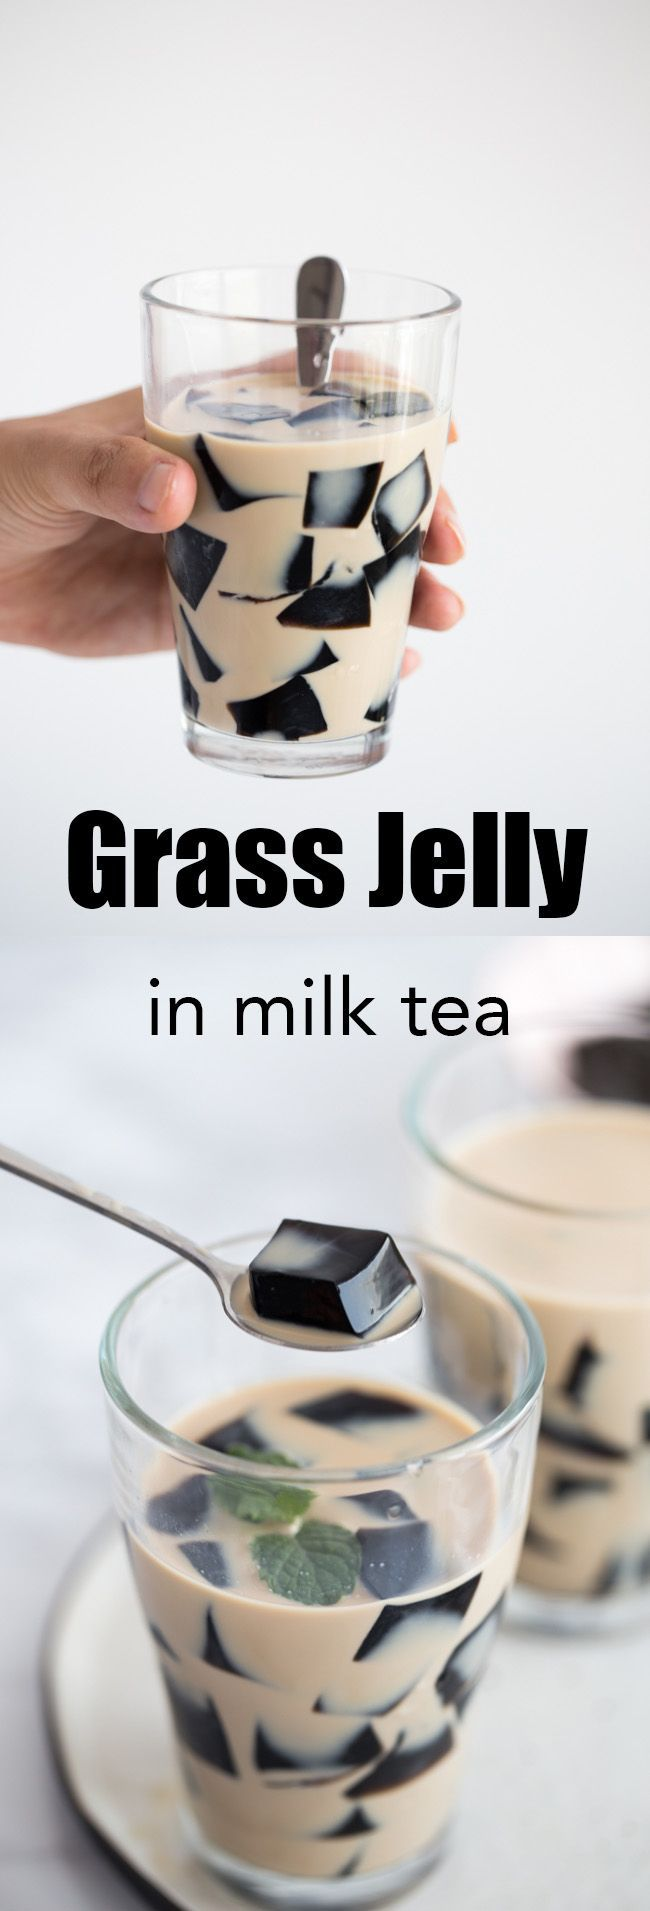 grass jelly in milk tea, grass jelly drink